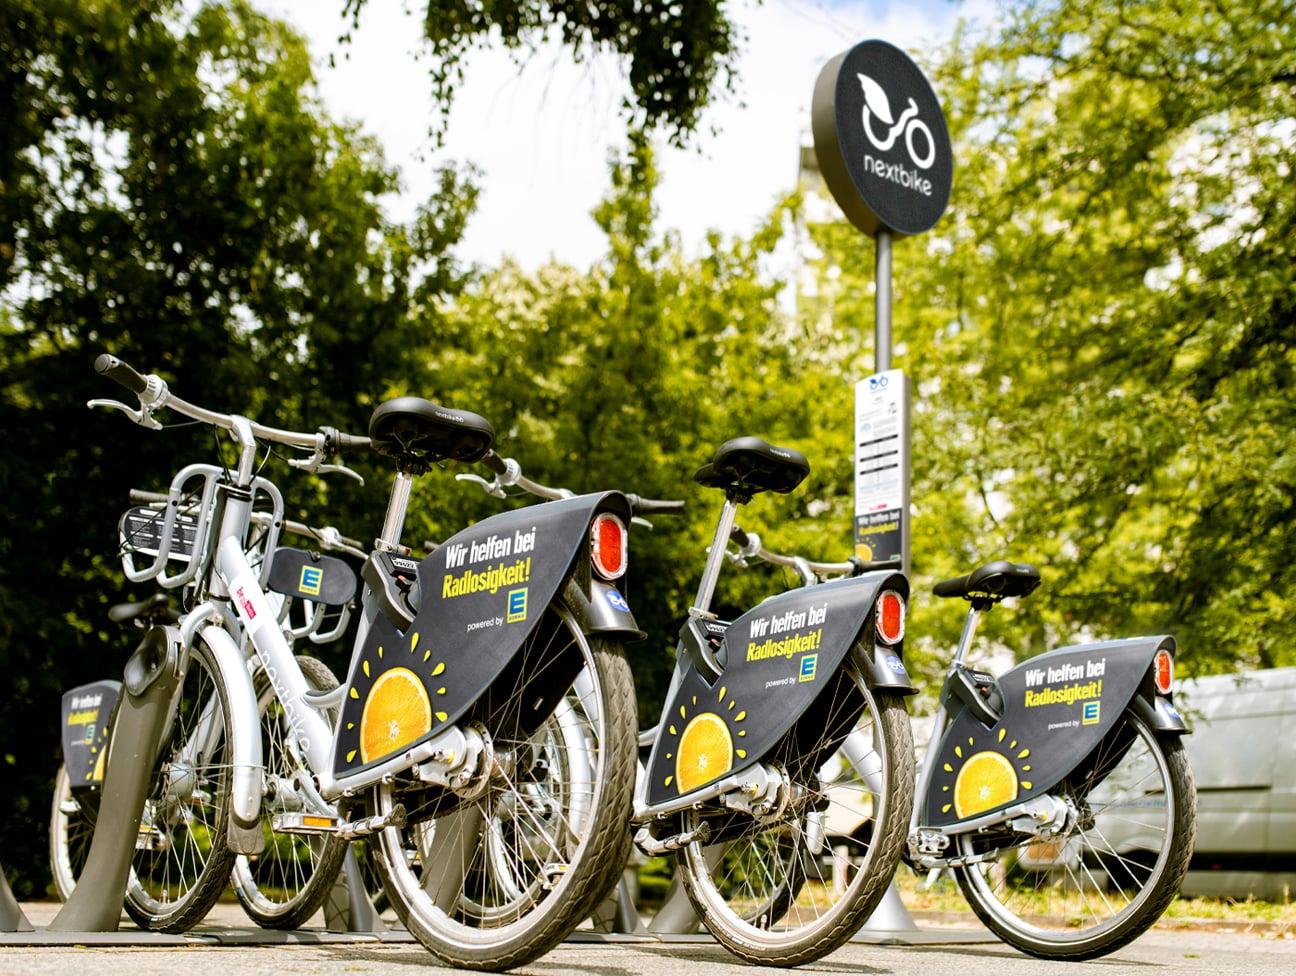 nextbike Edeka Station in Berlin